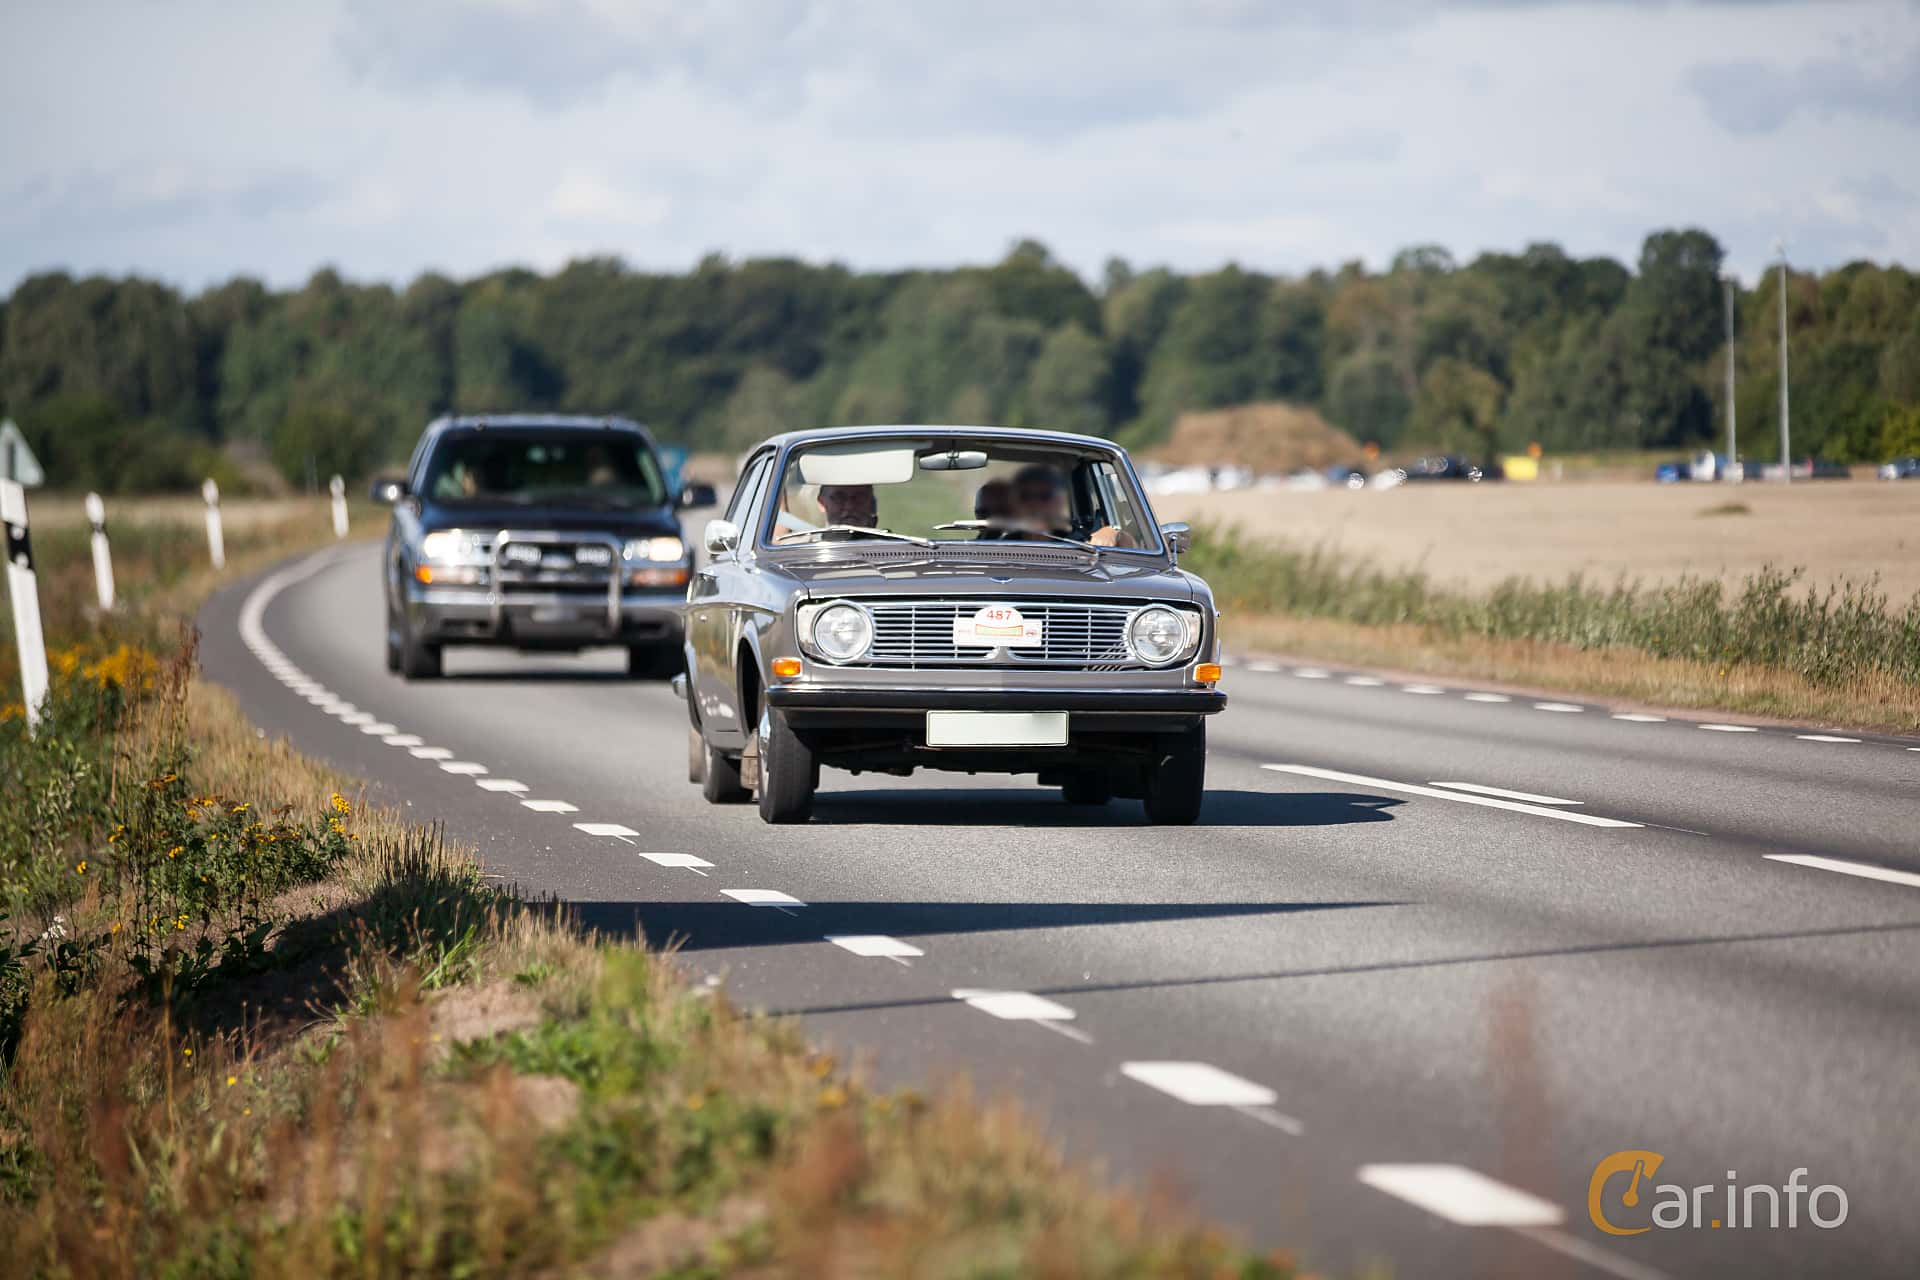 Volvo 142 1.8 Automatisk, 75hk, 1968 at Lergökarallyt 2018